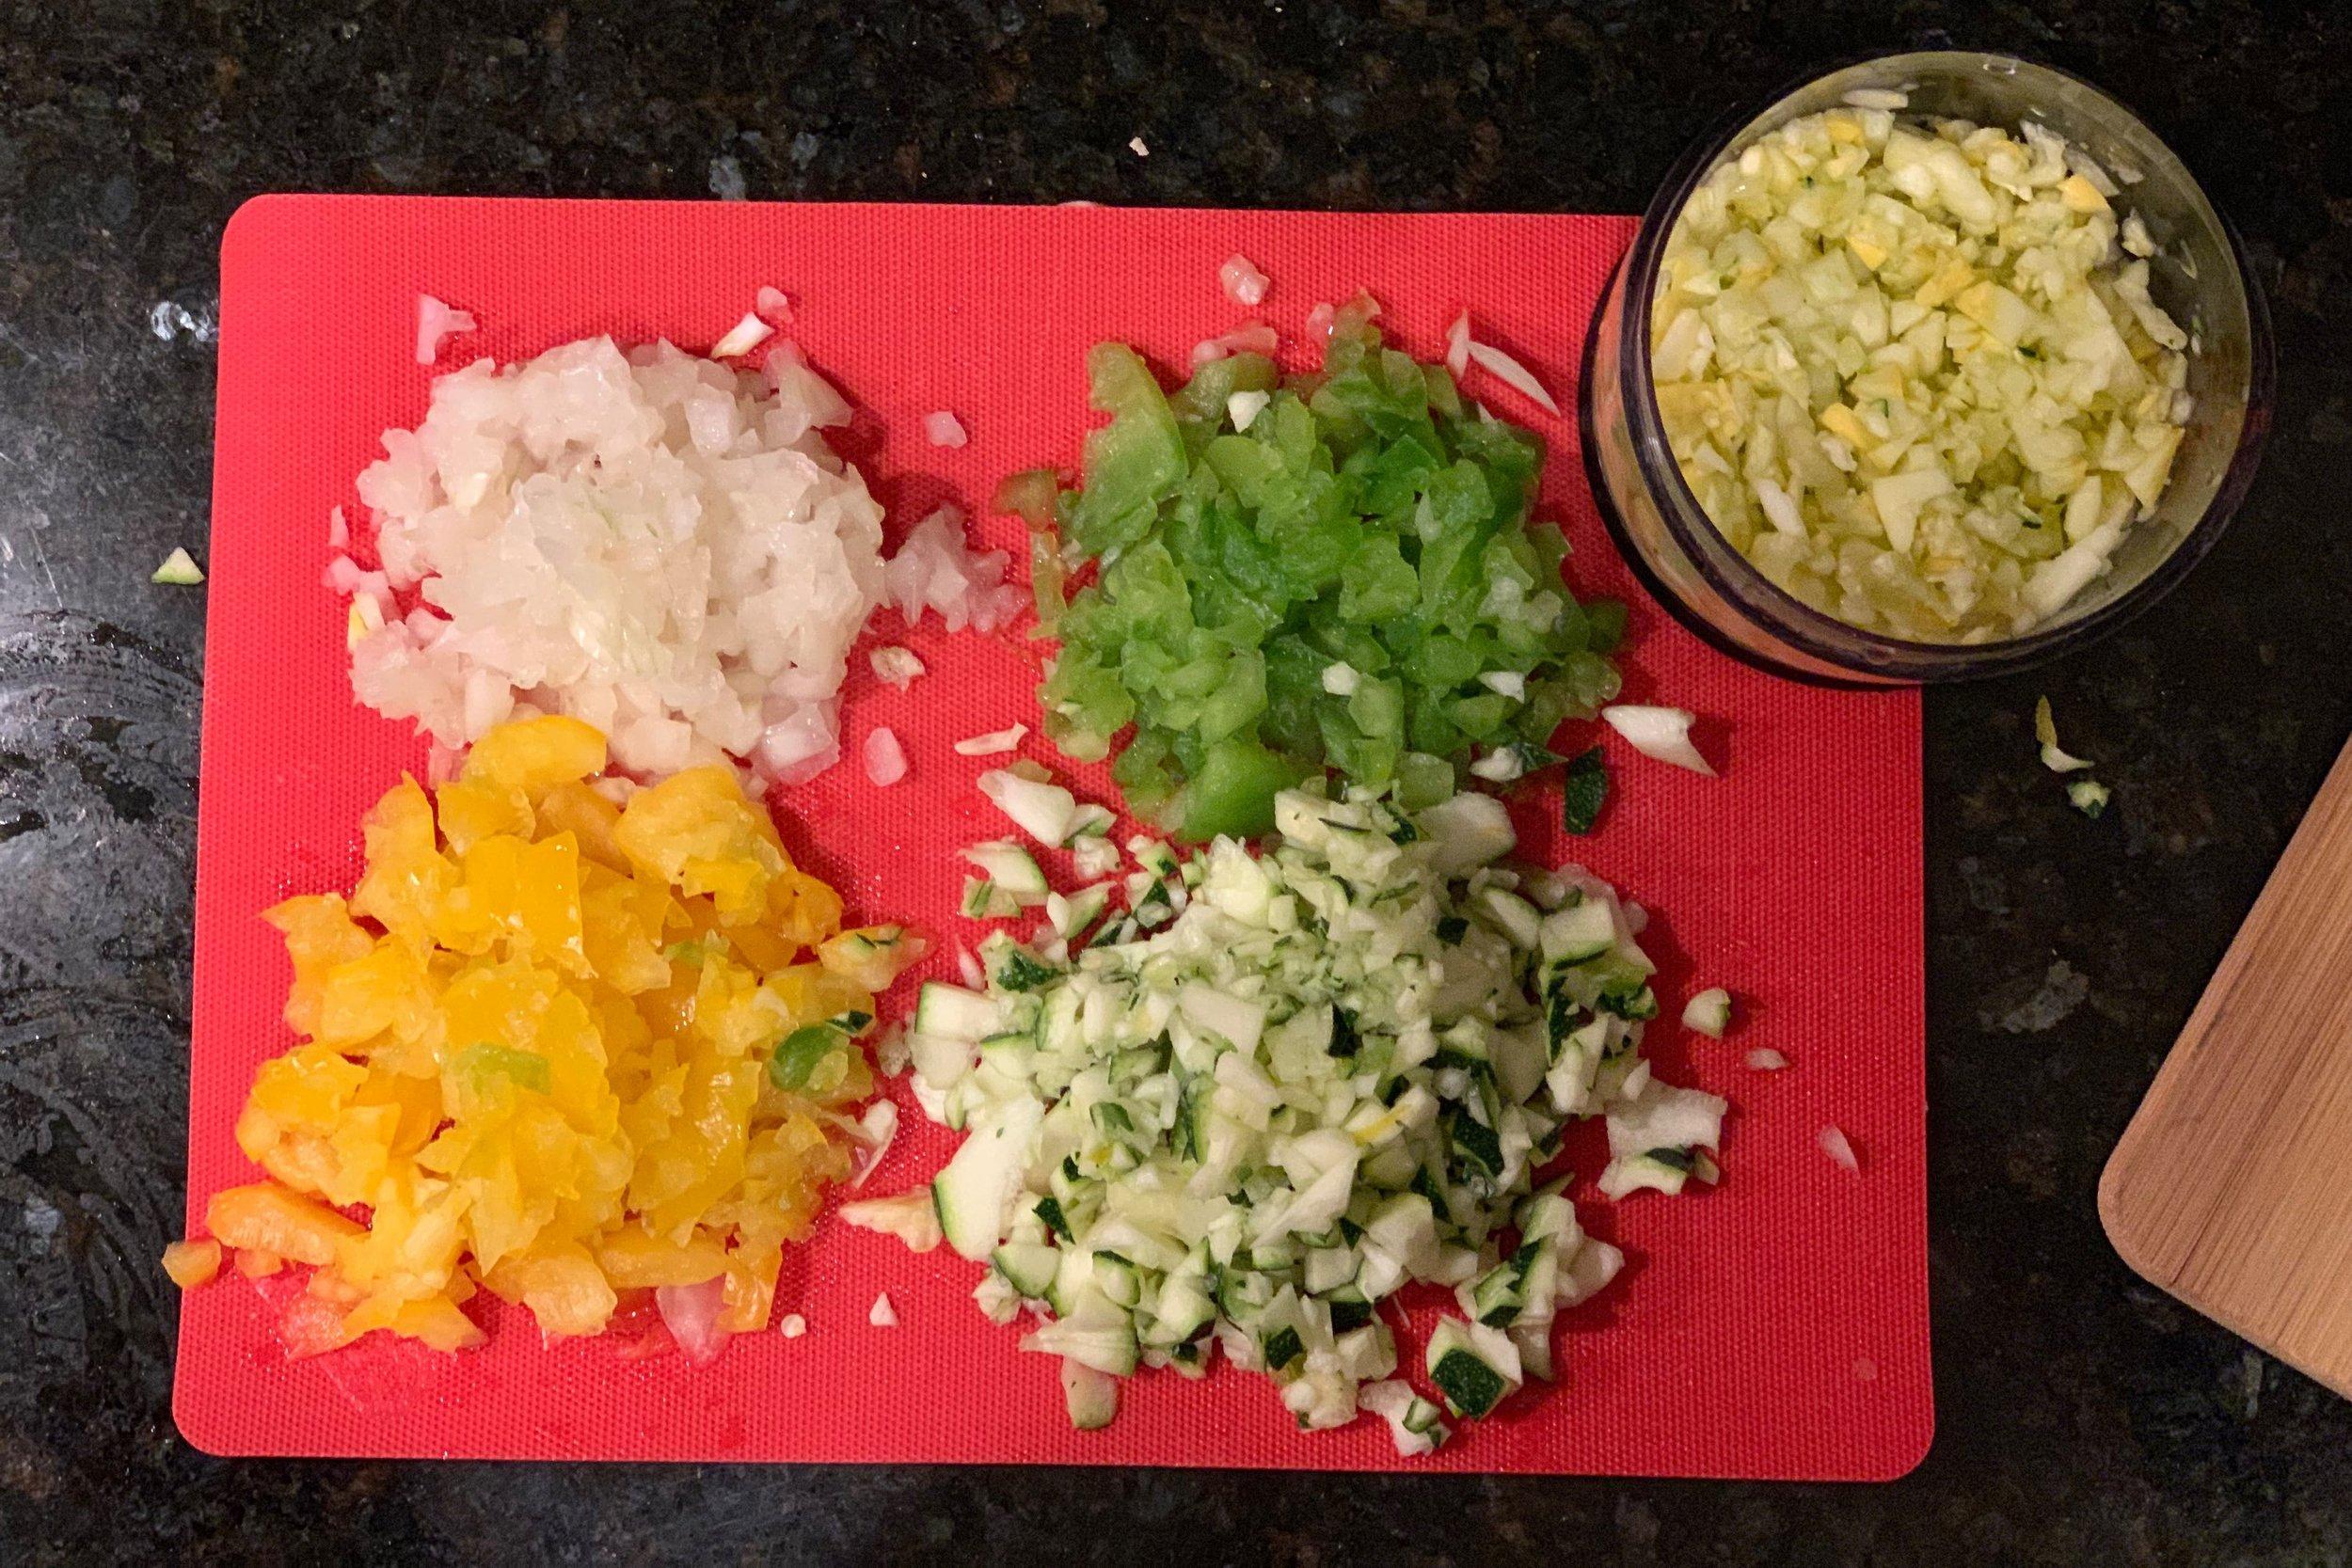 Diced vegetables.